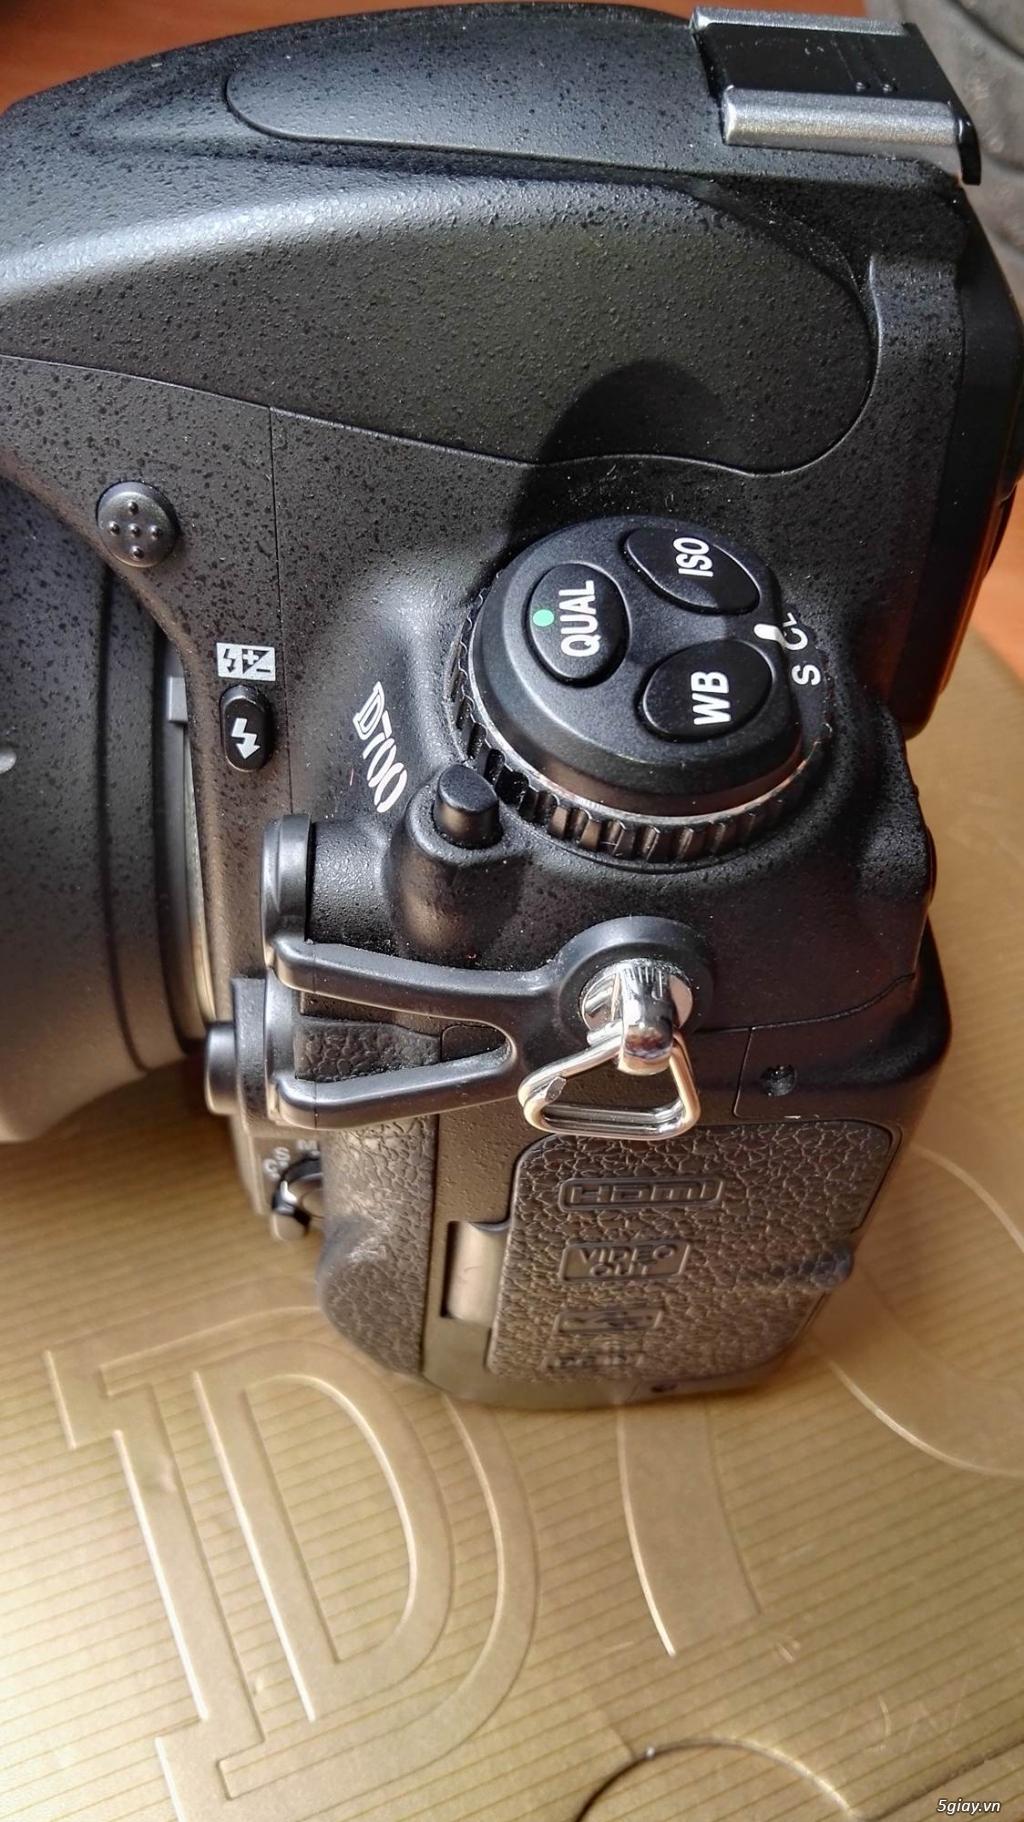 Body Nikon D700 + Lens 105f2.8 macro  Nano - 6